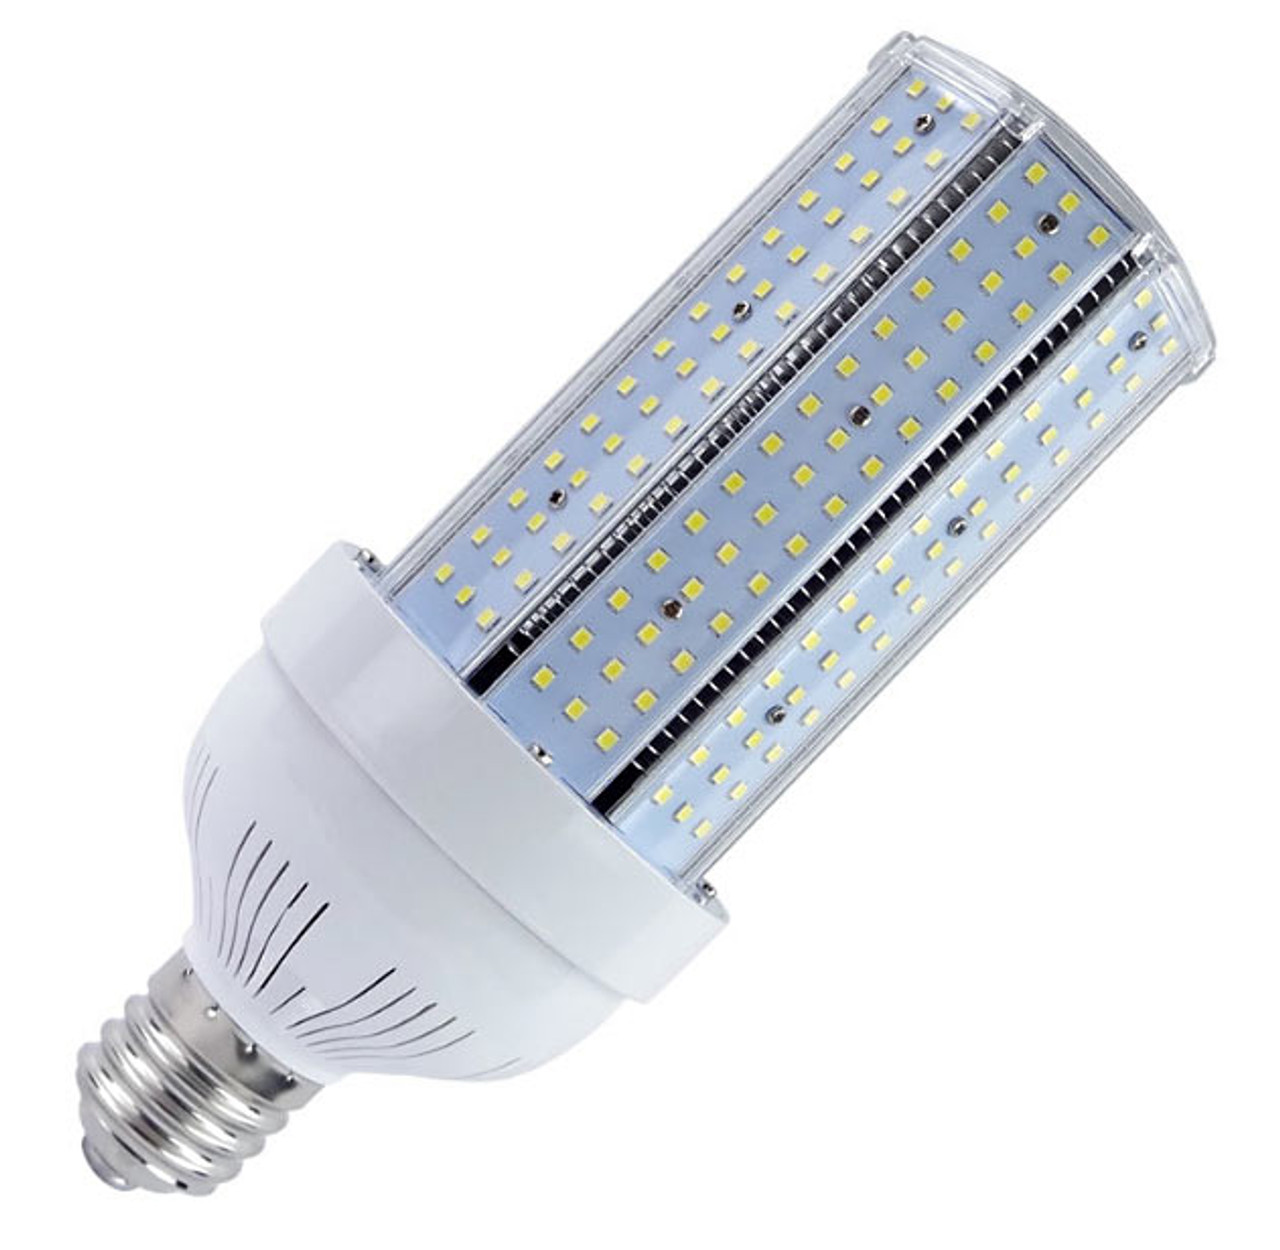 60 Watt High Output Led Corn Bulb Replaces 180 Watt Hid 9 000 Lumens Etl Dlc Listed 50 000 Hours 10 Year Warranty